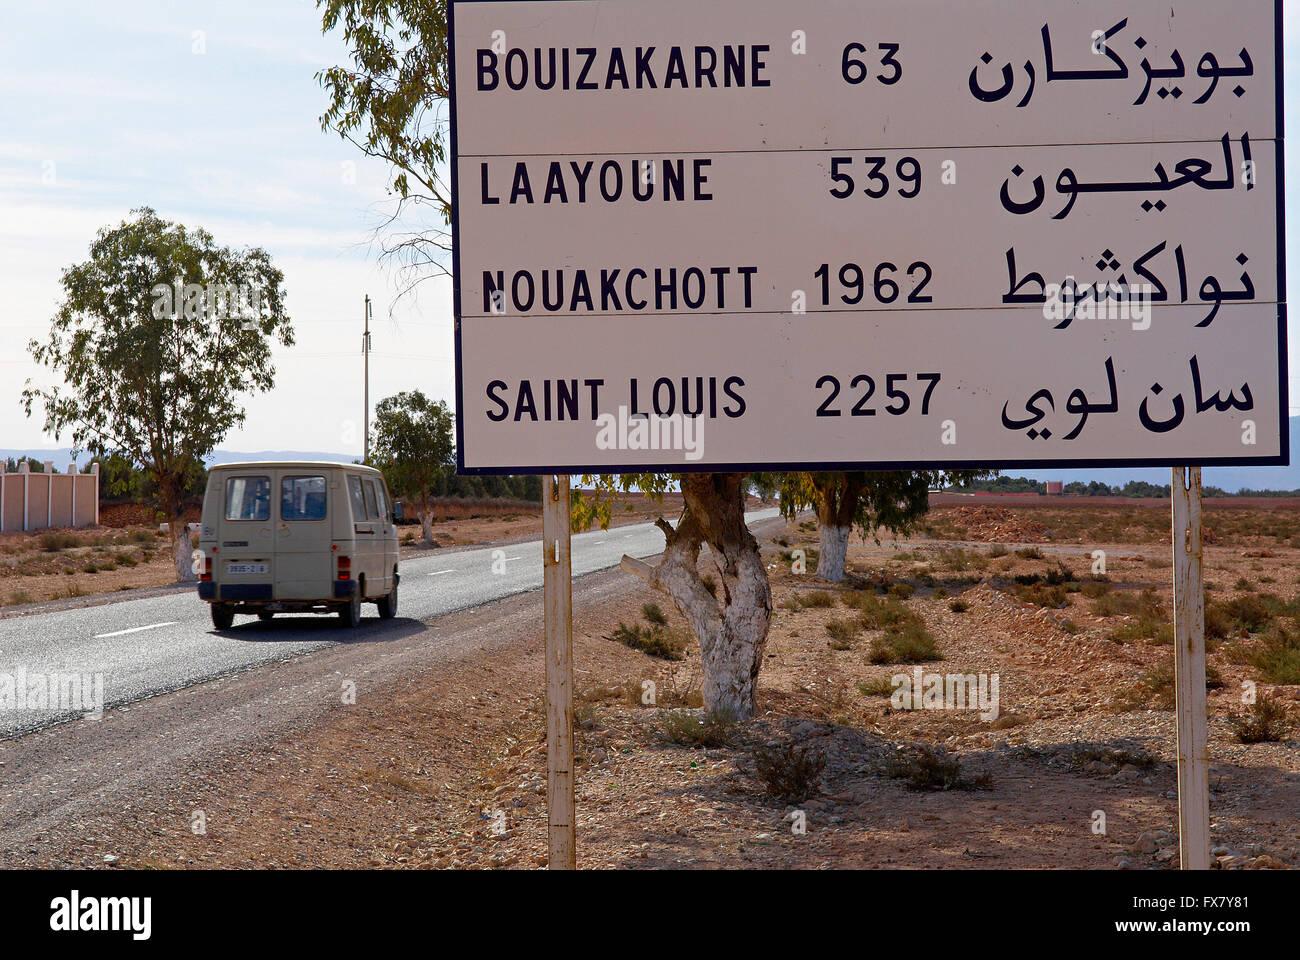 Morocco, Road to Laayoune, Former Spanish Sahara. - Stock Image